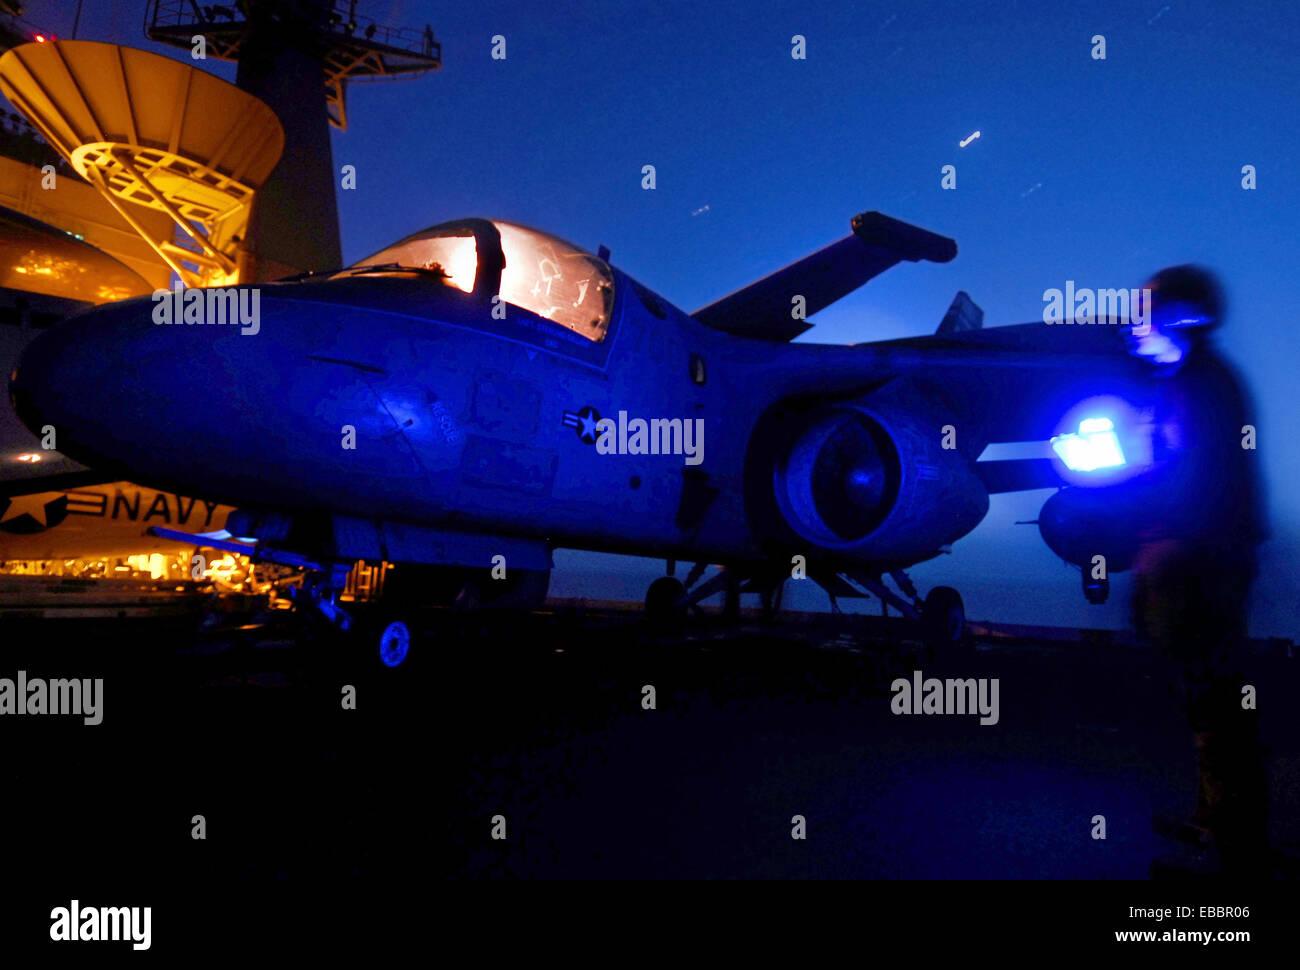 ARABIAN SEA (May 5, 2007) - Airman Malcom Hines performs final preflight checks on an S-3B Viking, from the ´Top - Stock Image